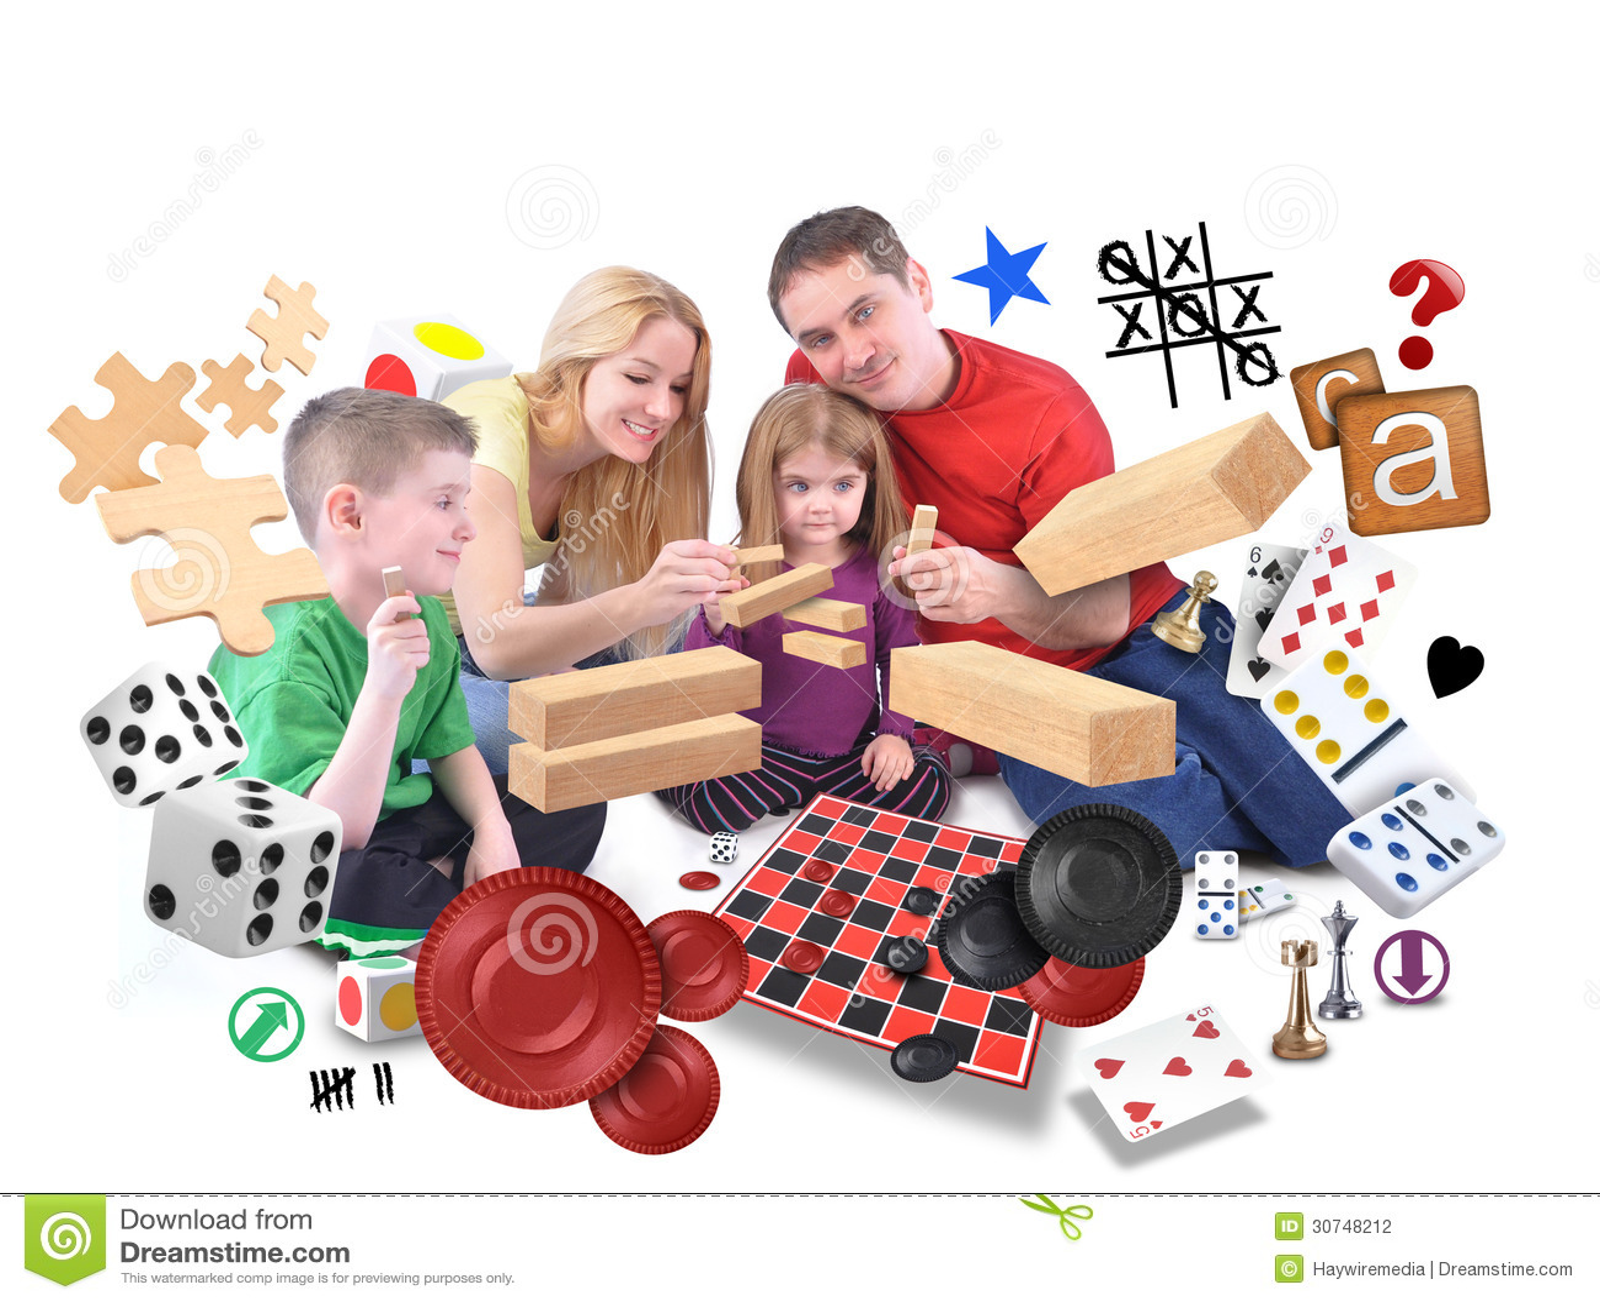 Www board games online compete